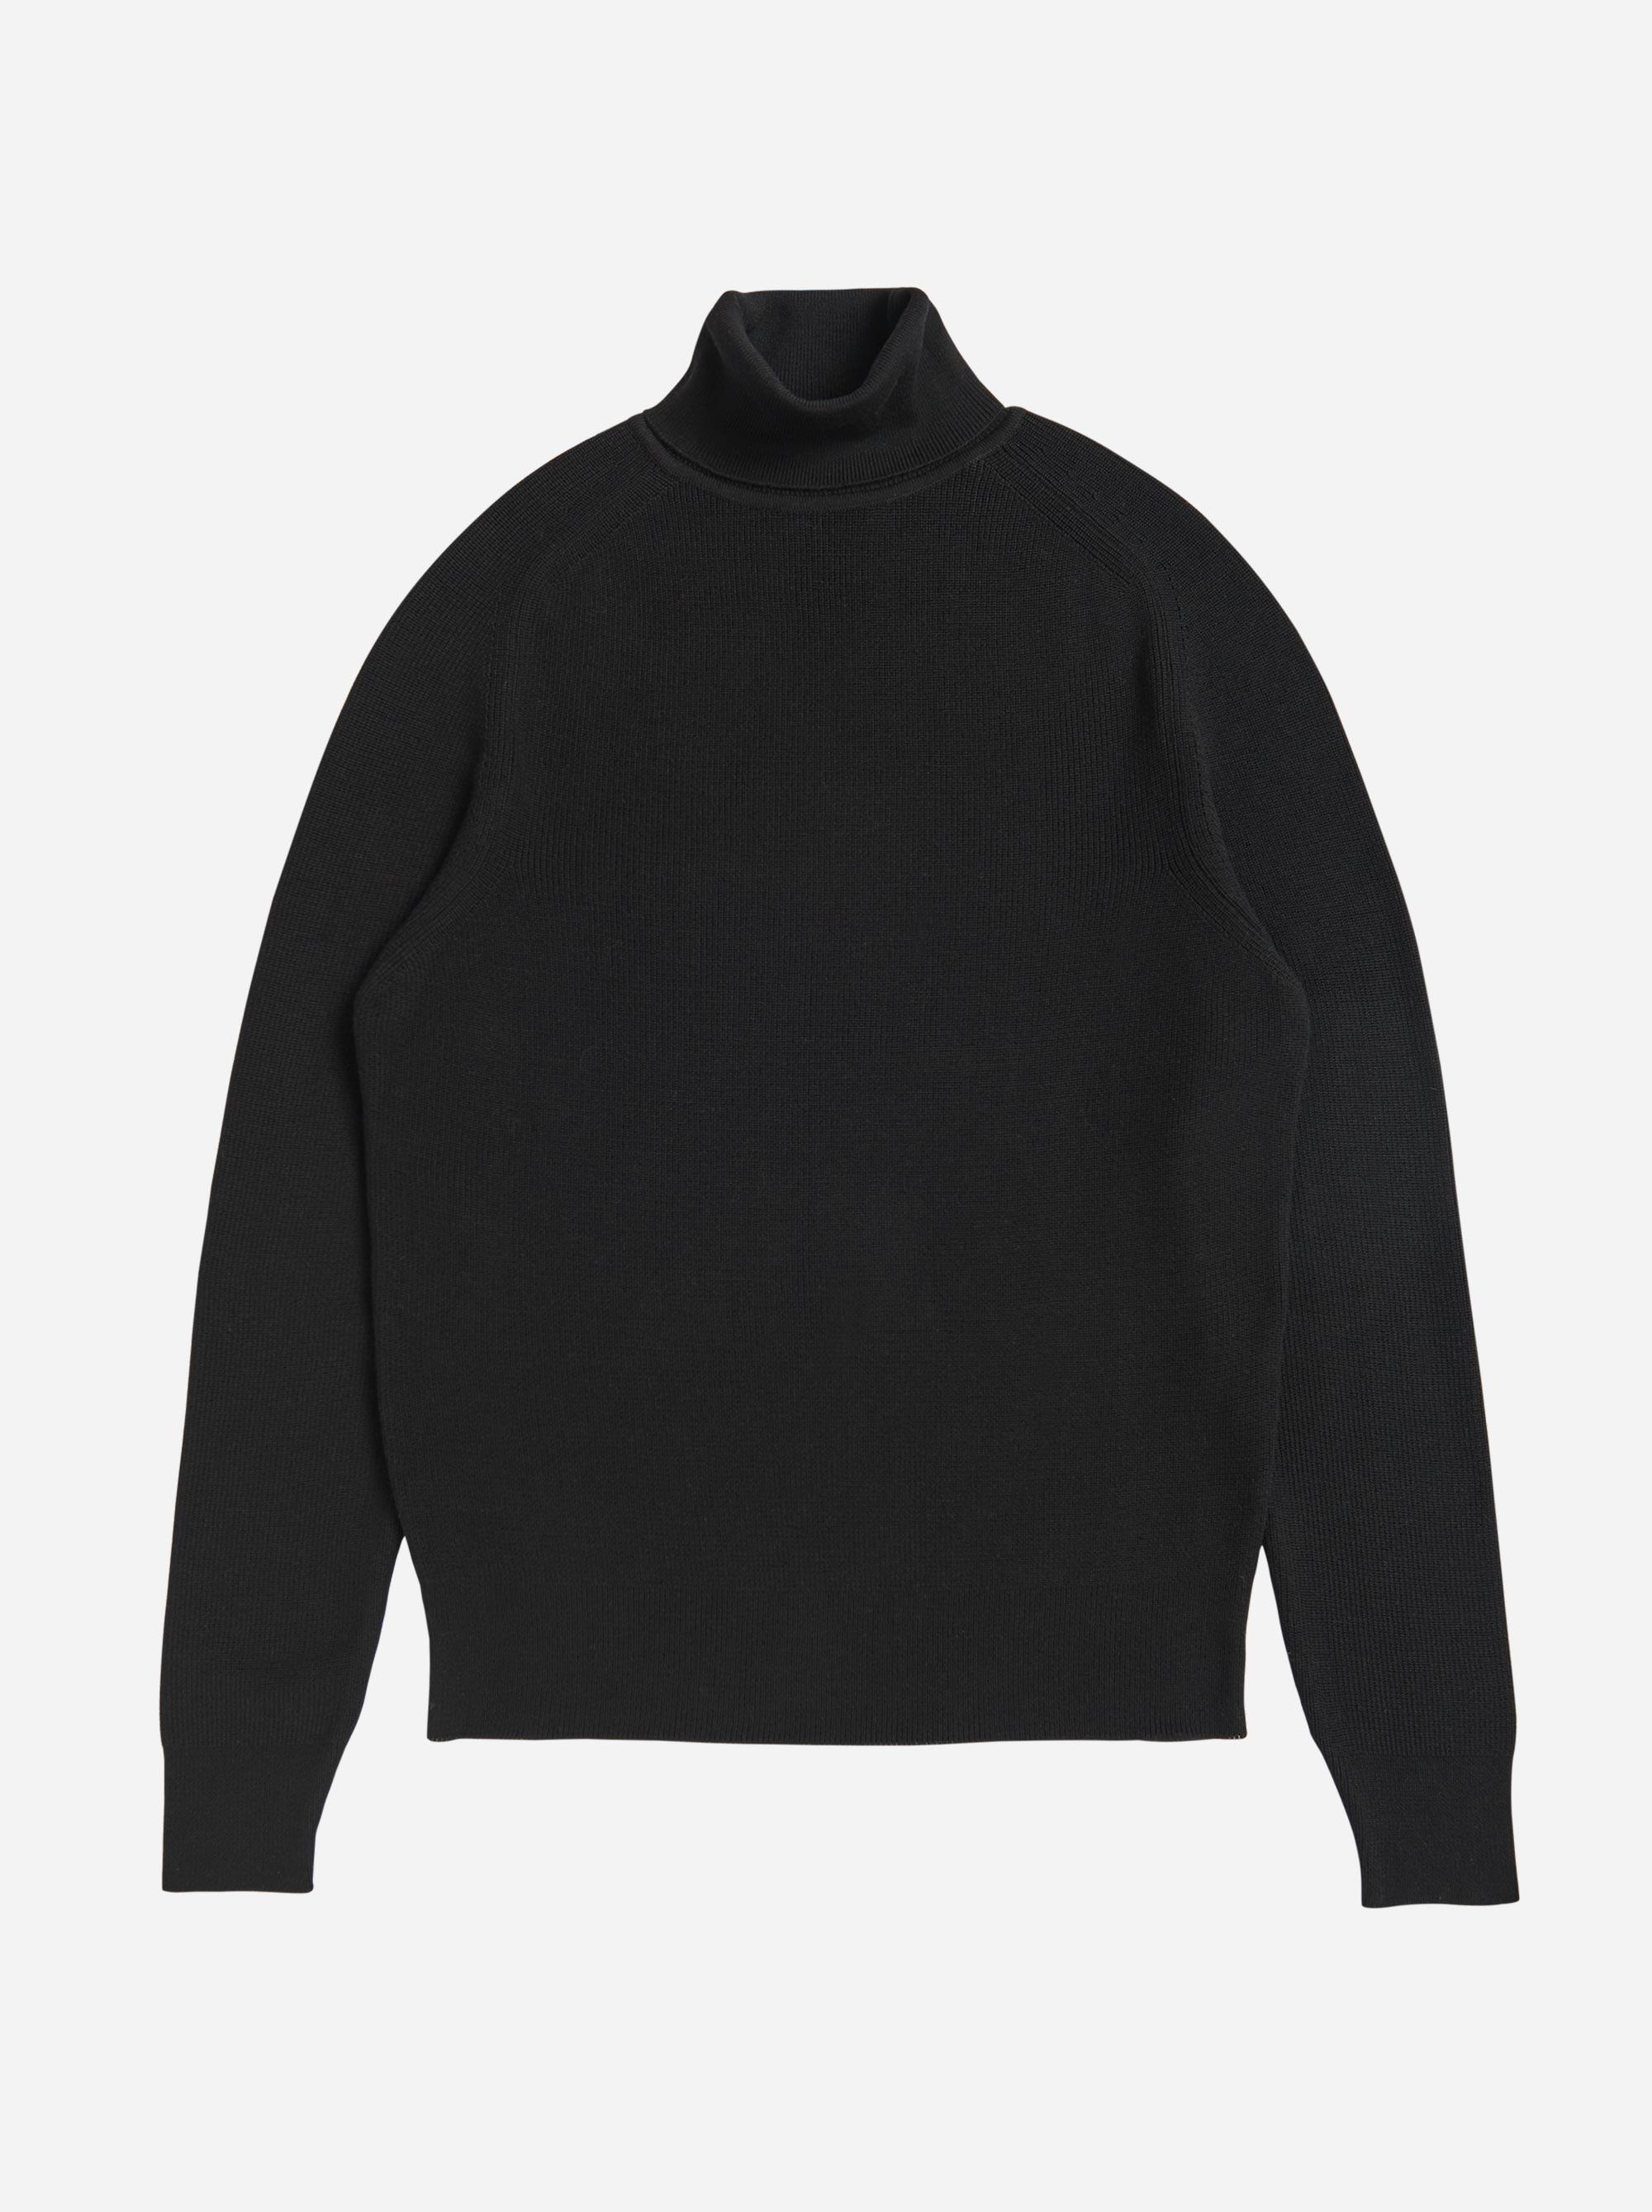 Teym - Turtleneck - The Merino Sweater - Women - Black - 4